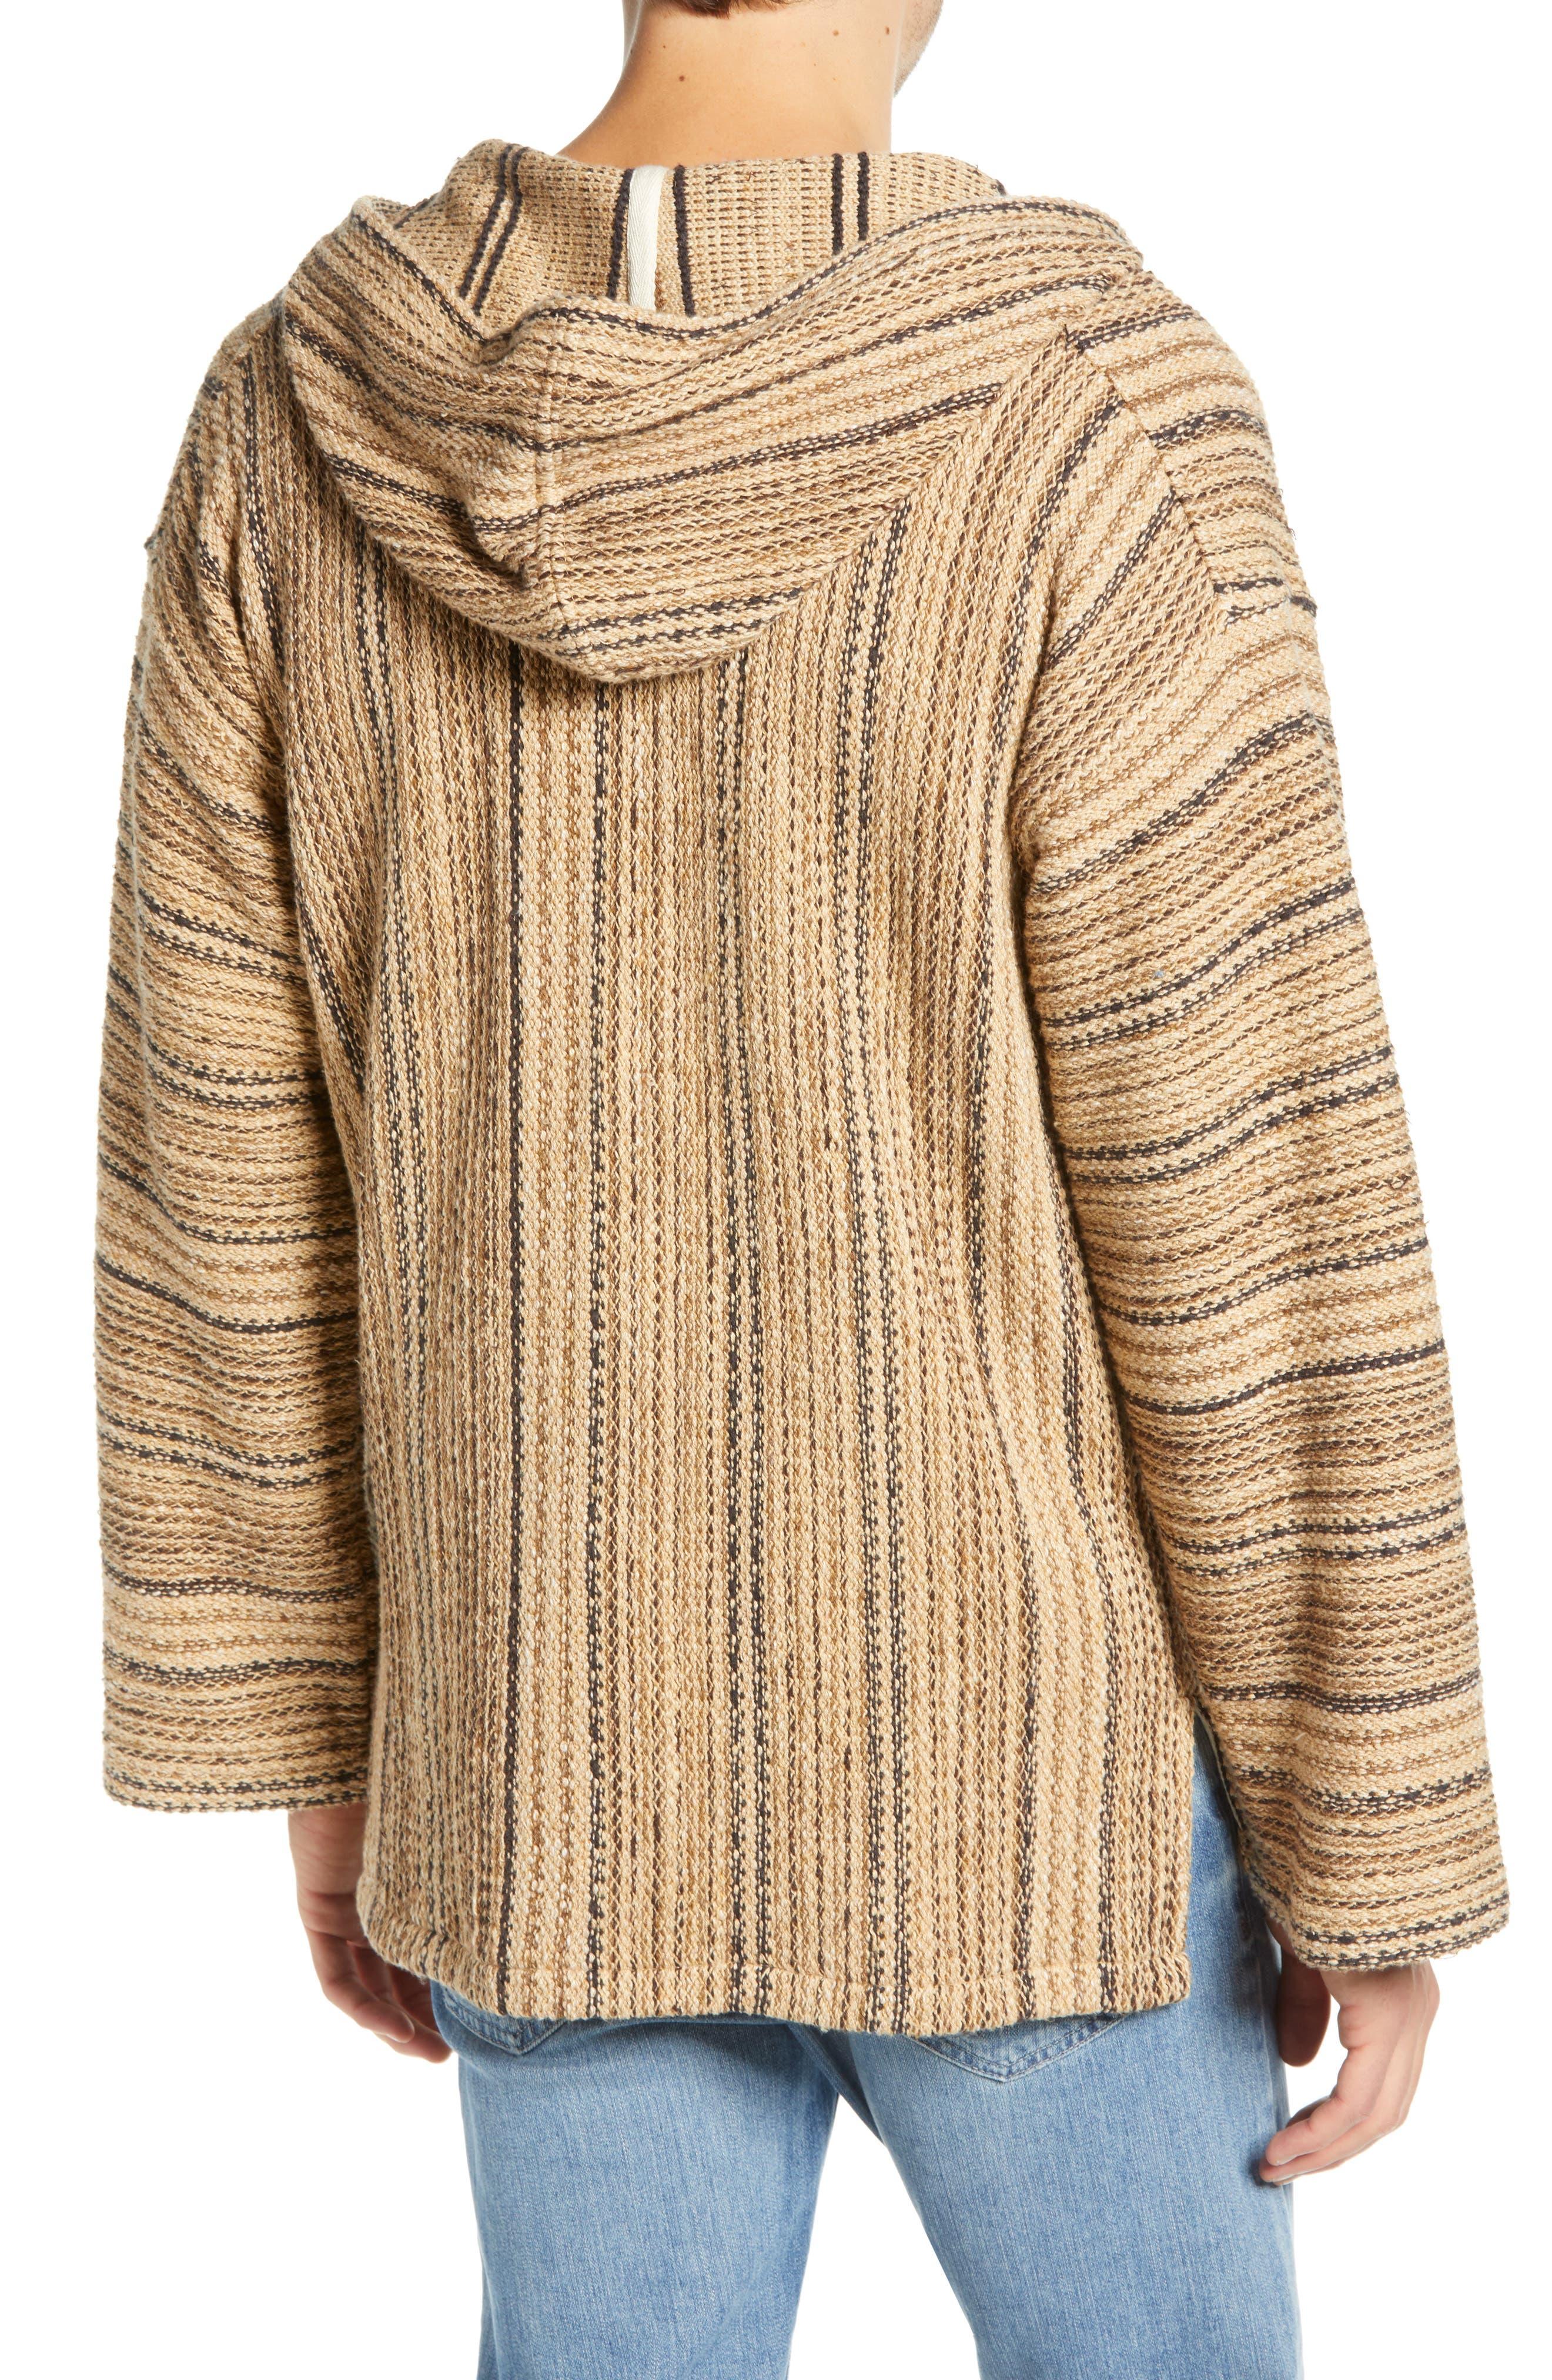 FRYE, Baja Hooded Pullover, Alternate thumbnail 2, color, TAOS TAUPE STRIPE